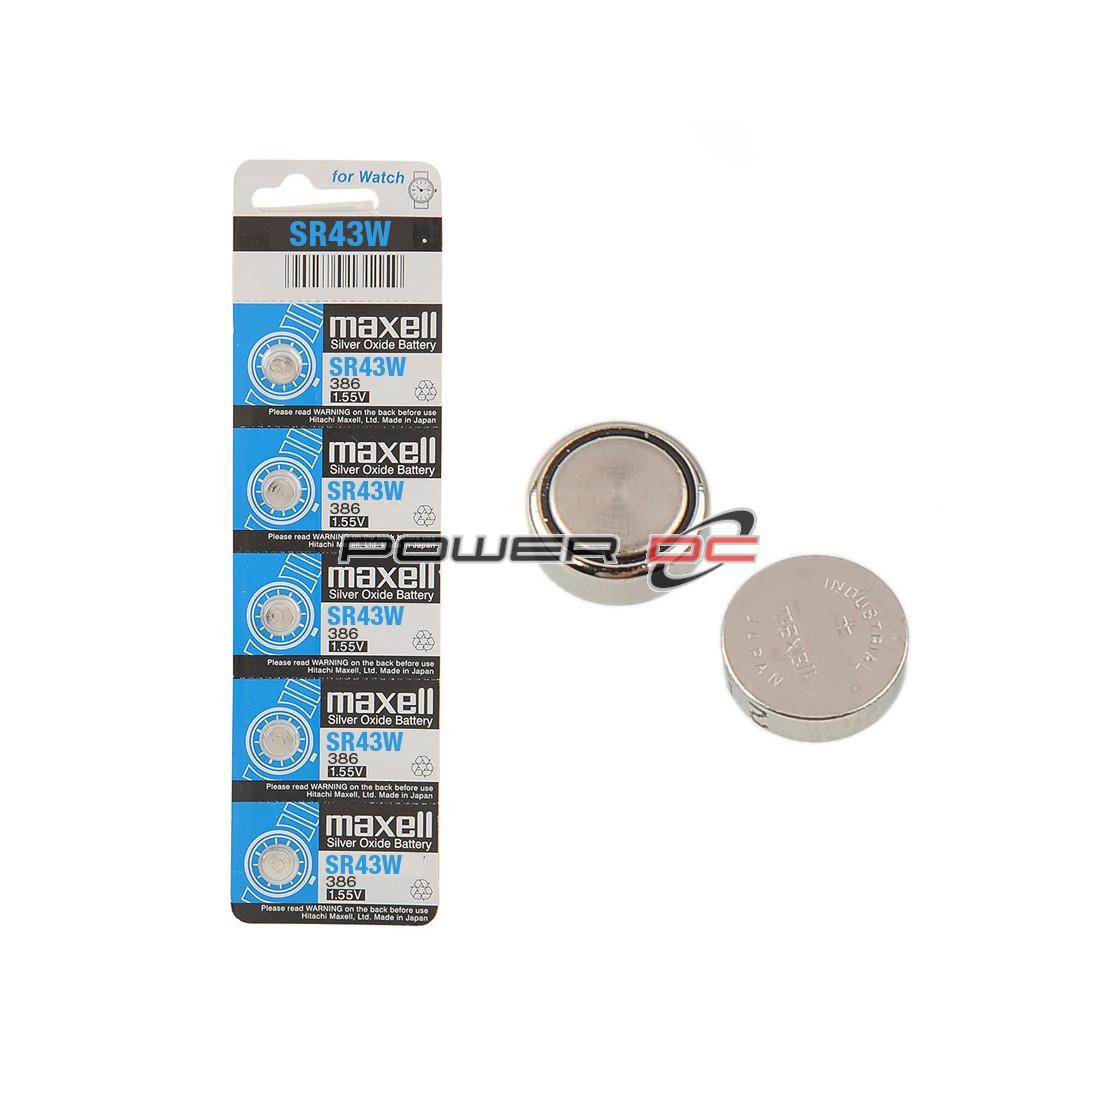 MAXELL SR43W S/OX BUTTON CELL BP5